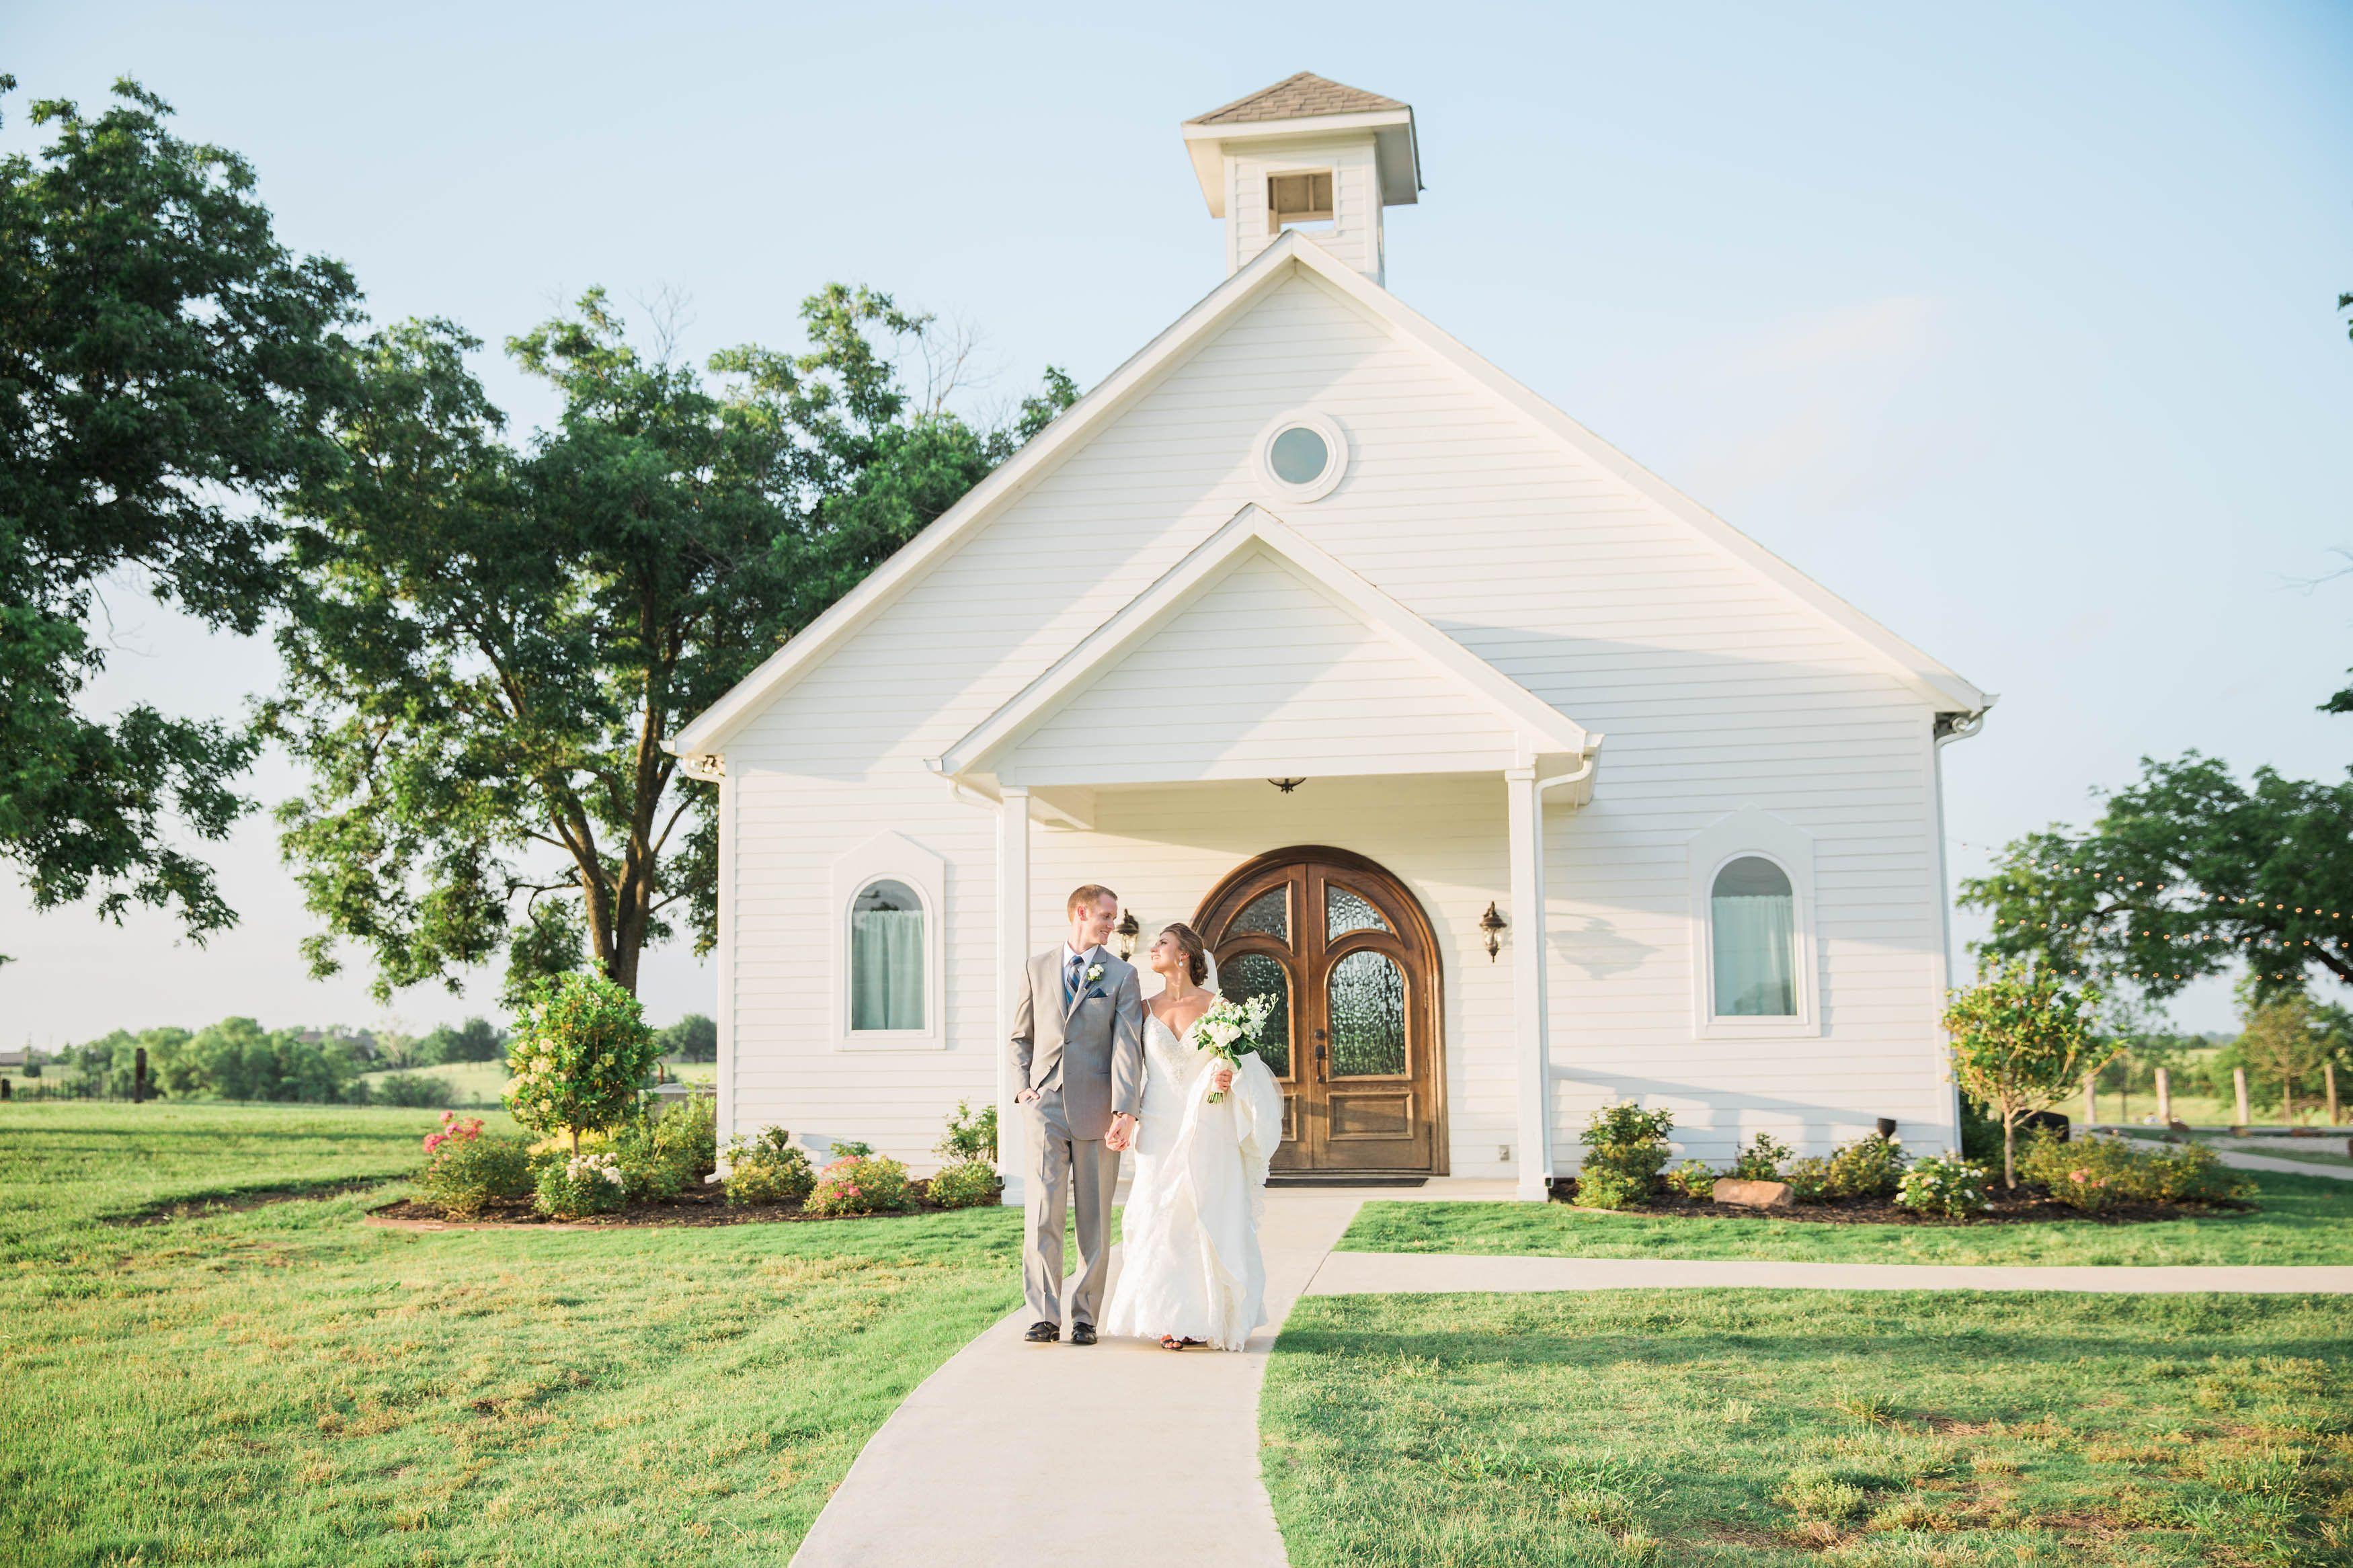 Wedding Venue Near Dallas Mckinney Plano Allen Sherman Texas Wedding Chapel Near Sherman Mc Wedding Venues Texas Wedding Venues Dallas Tx Chapel Wedding